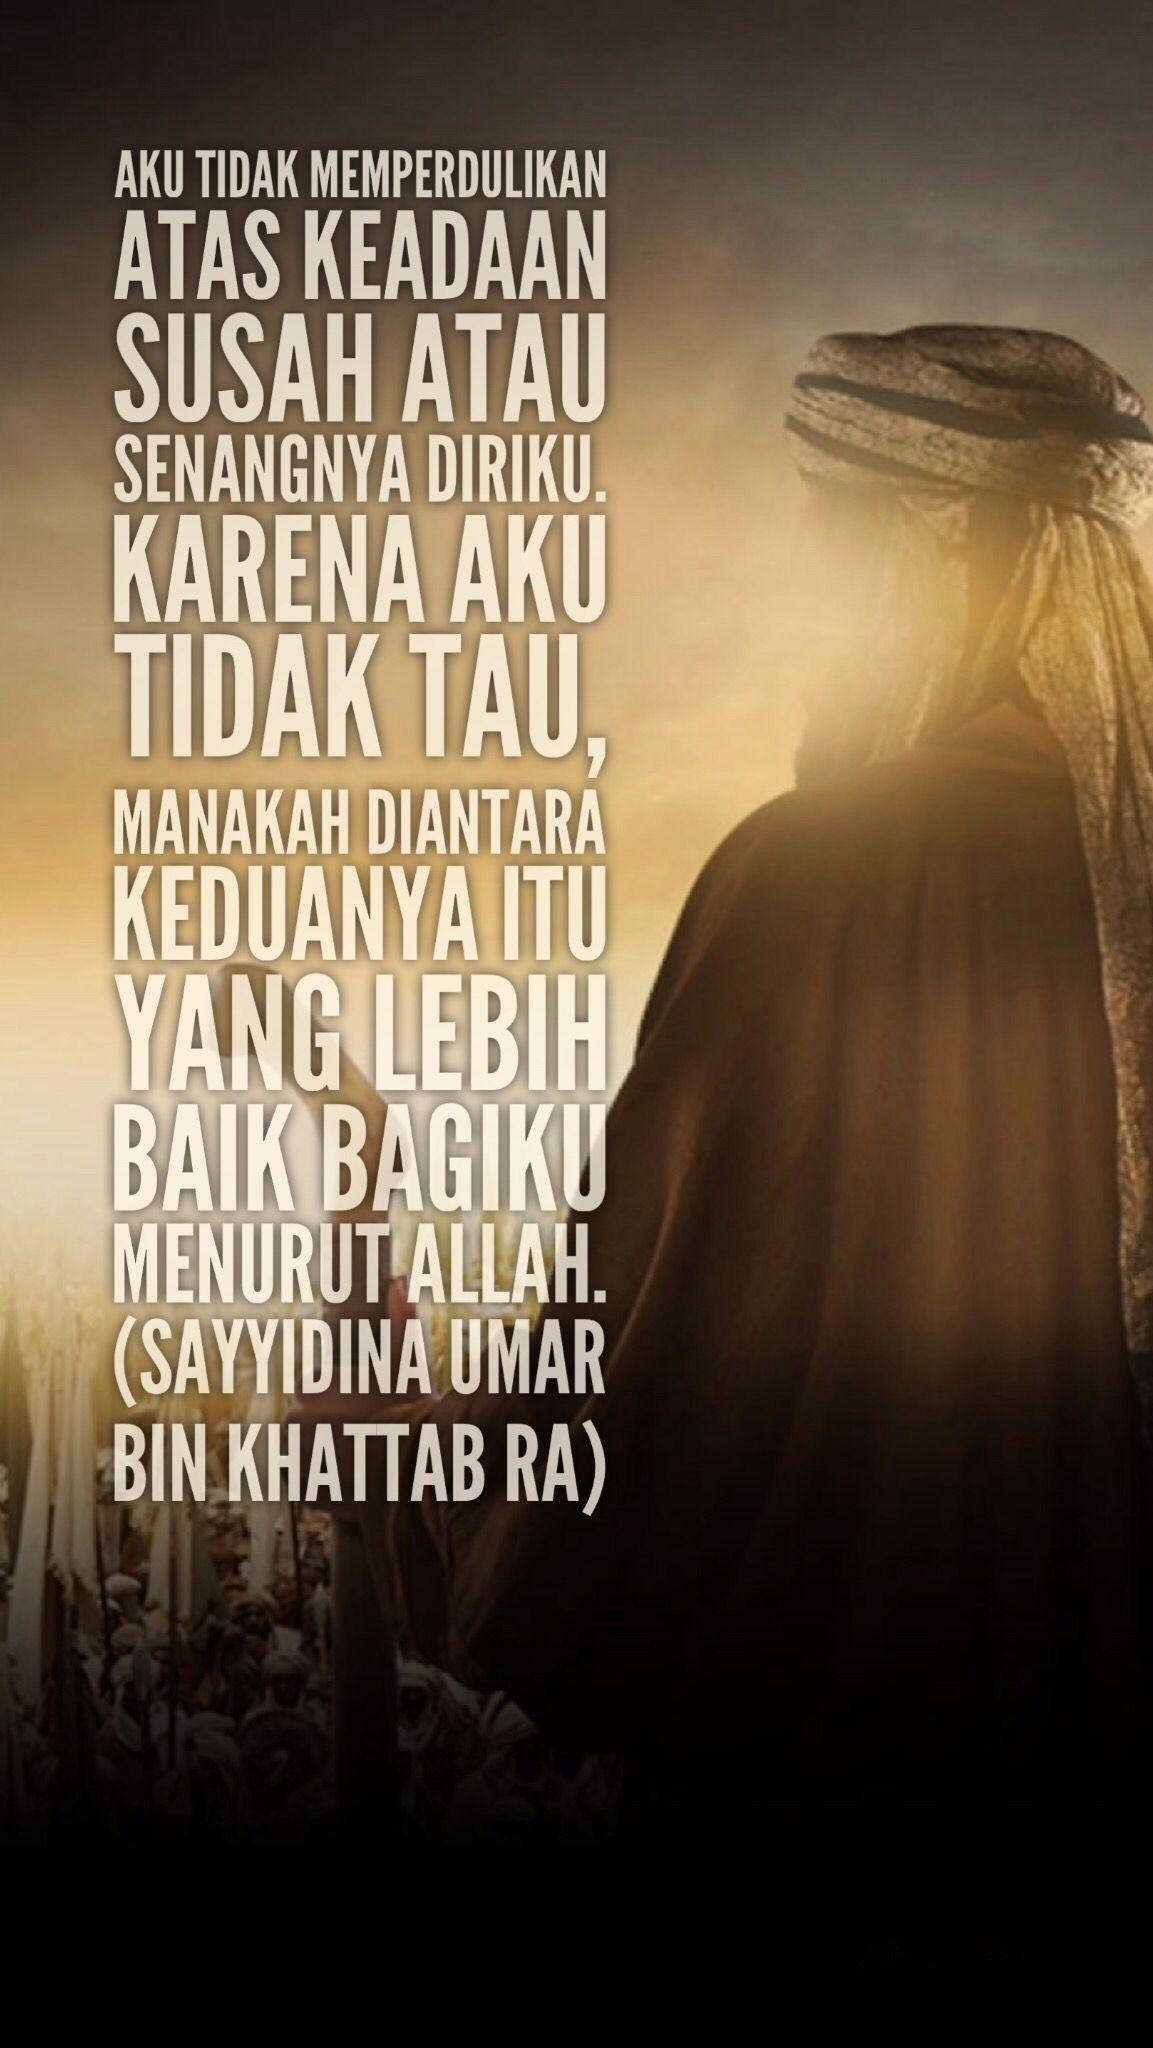 Quoteislam Umarbinkhattab Umar Barakallah Taqwalife Islamic